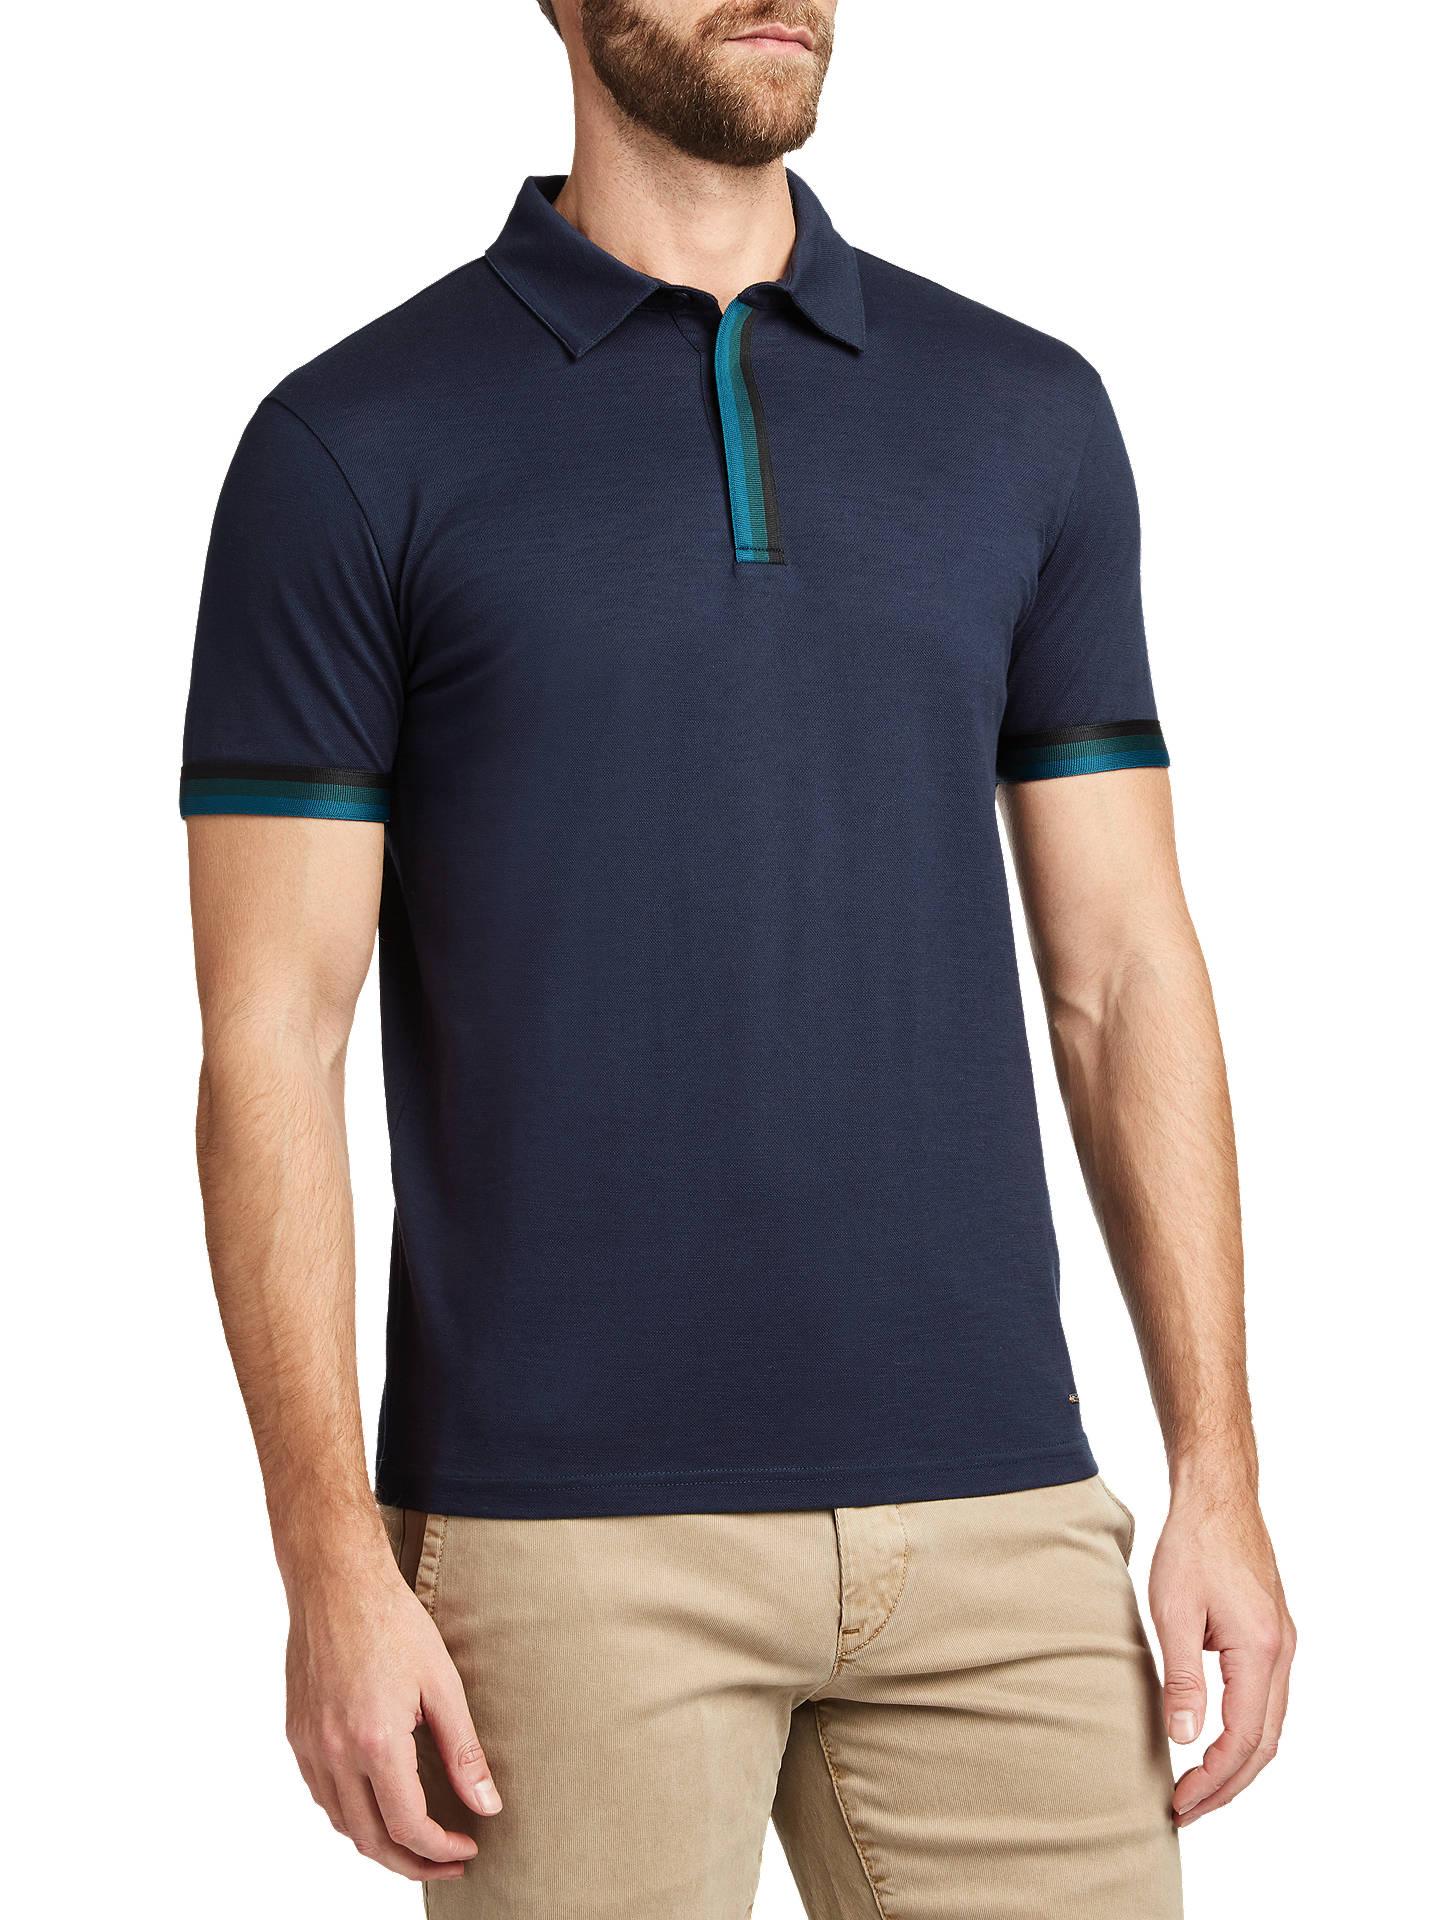 Boss Paxto Short Sleeve Polo Shirt Dark Blue At John Lewis Partners